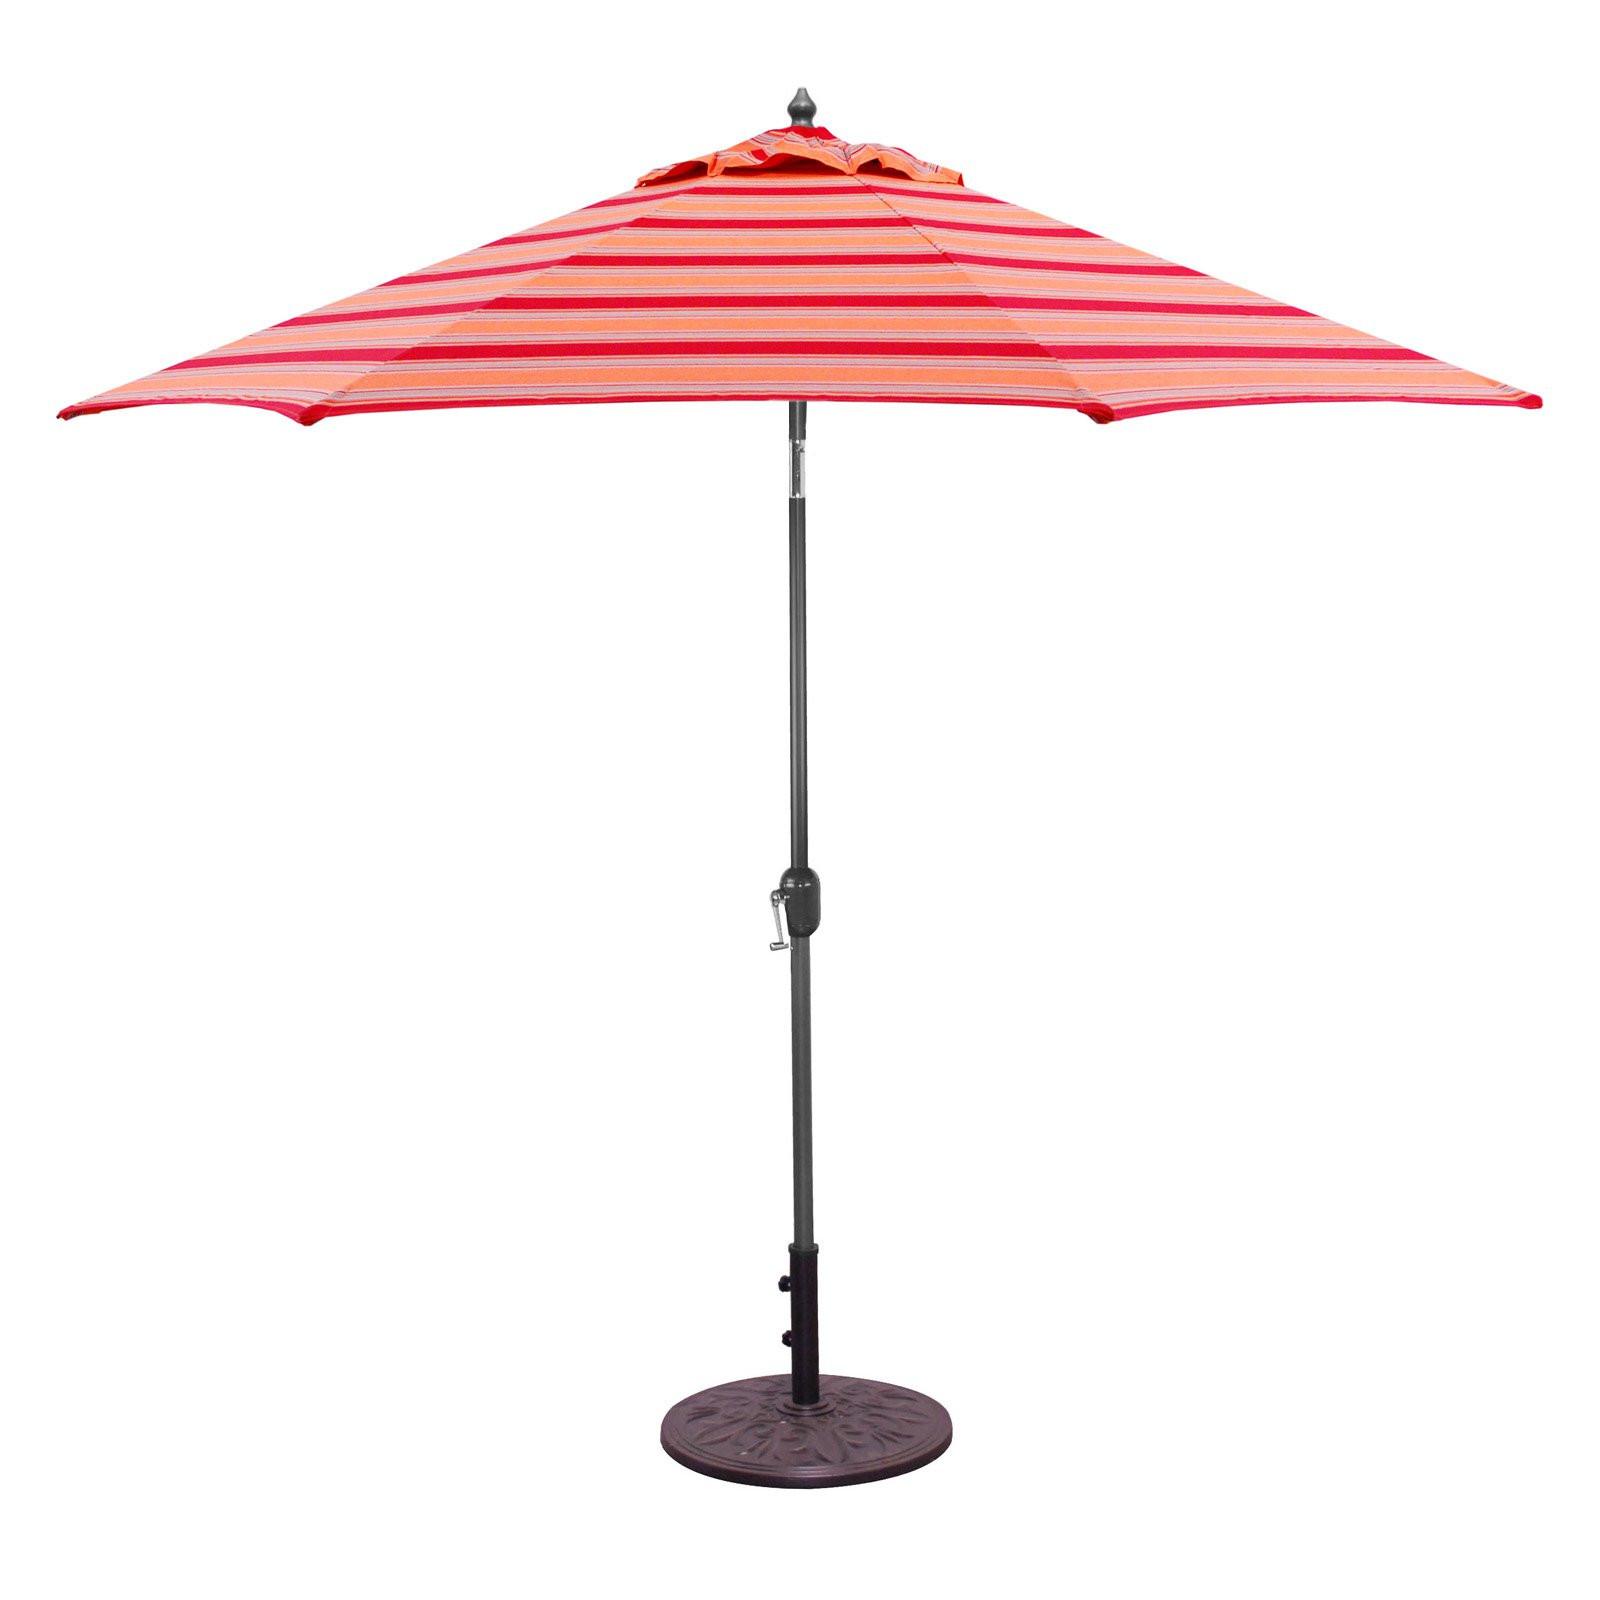 Best ideas about Patio Umbrellas Walmart . Save or Pin Galtech 9 ft Sunbrella Aluminum Patio Umbrella Walmart Now.